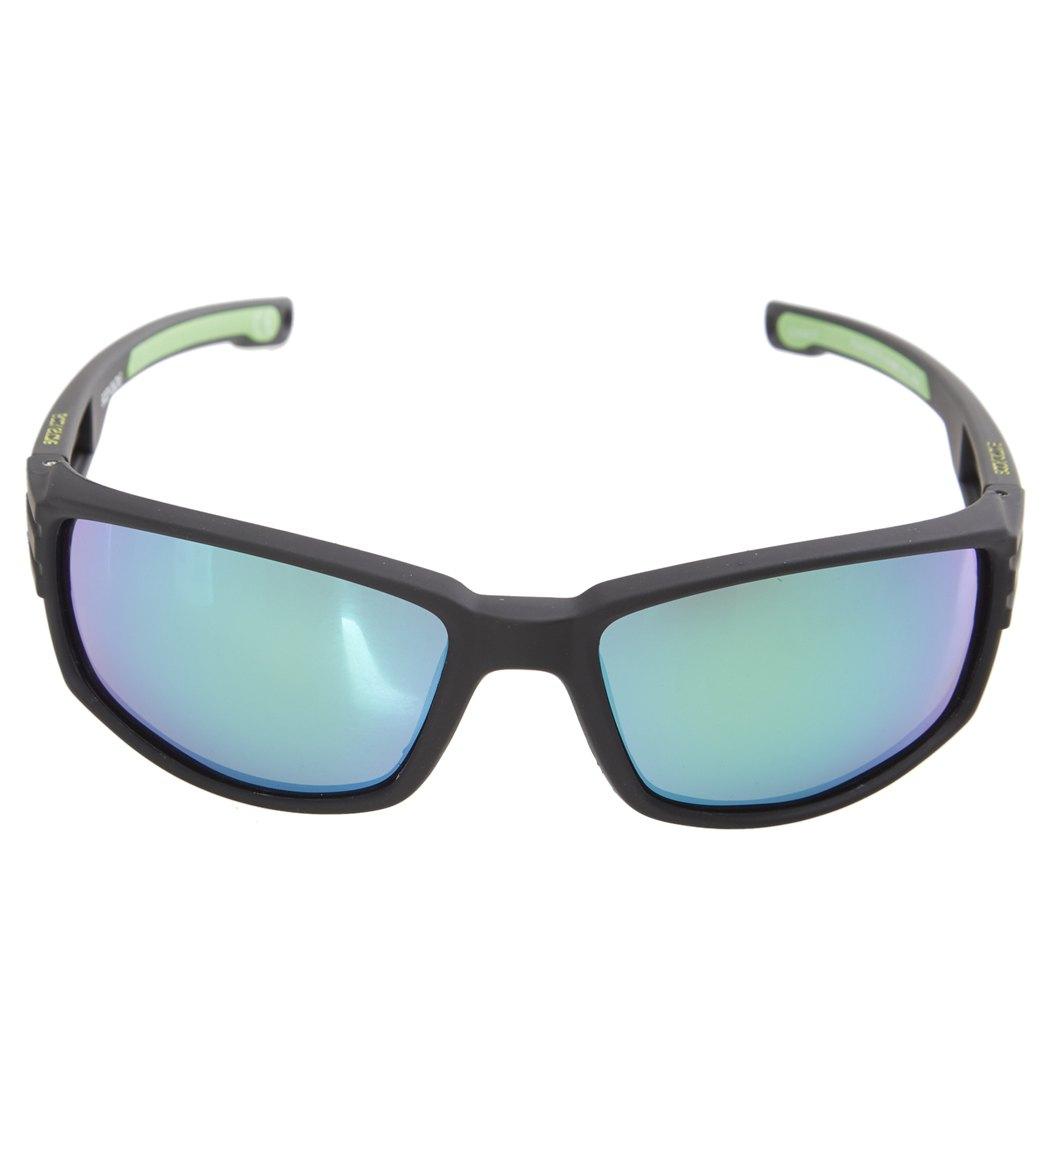 baa3a7c642 Body Glove FL19-A Polarized Floating Sunglasses